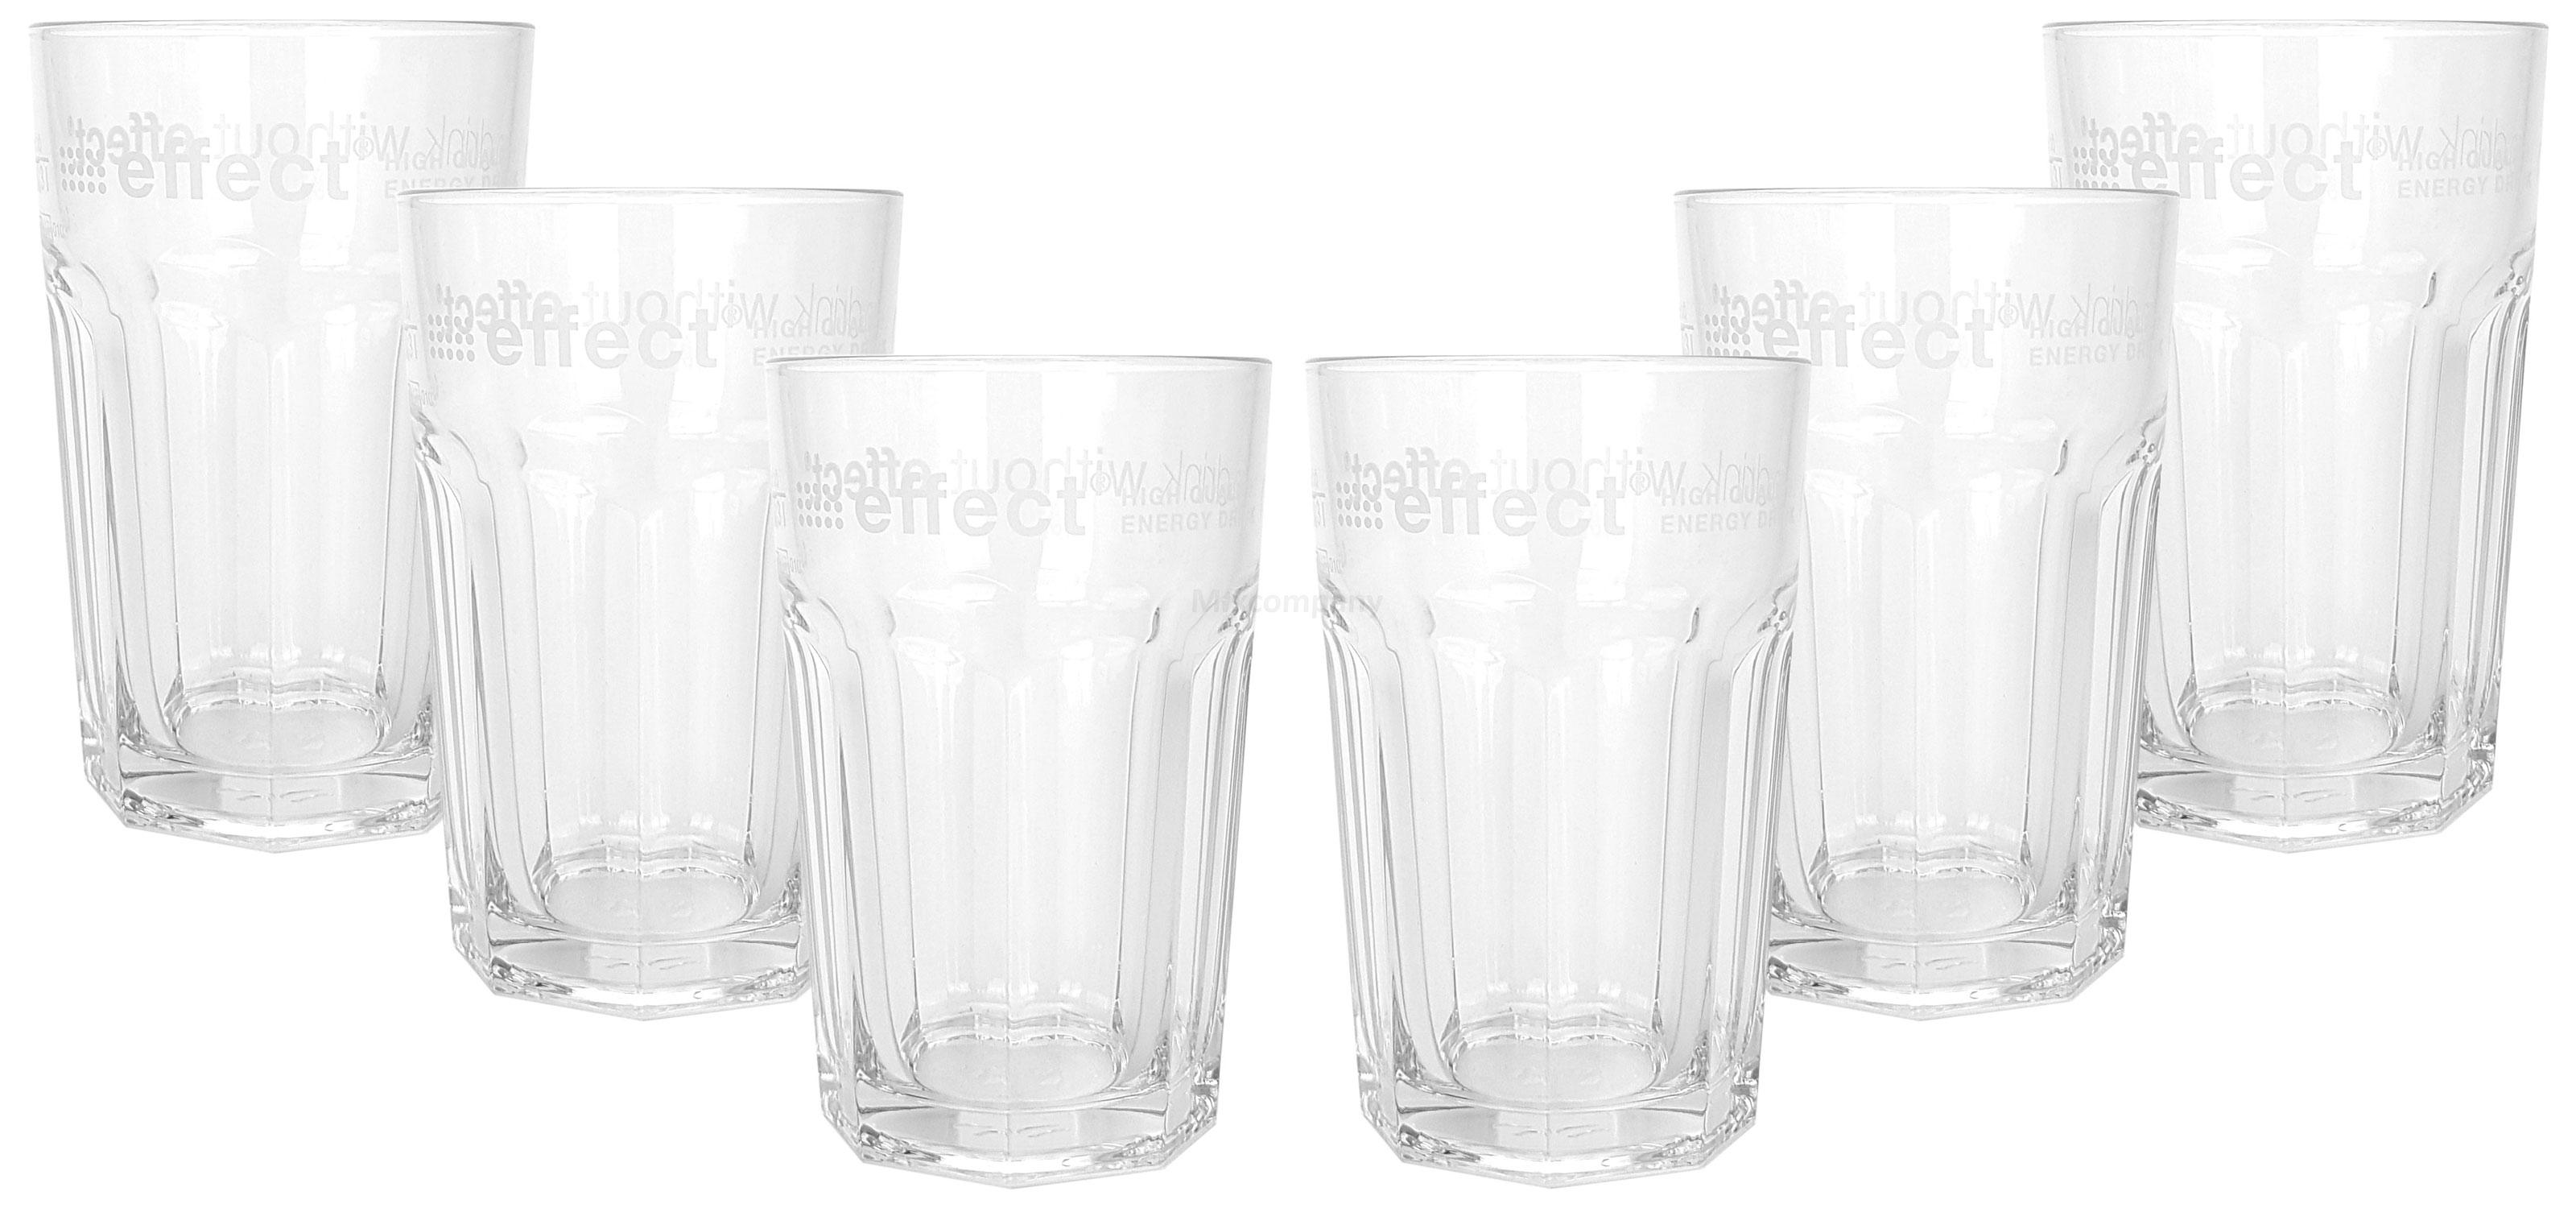 Effect Longdrinkglas Longdrink Glas Gläser Set - 6x Longdrinkgläser 0,3l geeicht